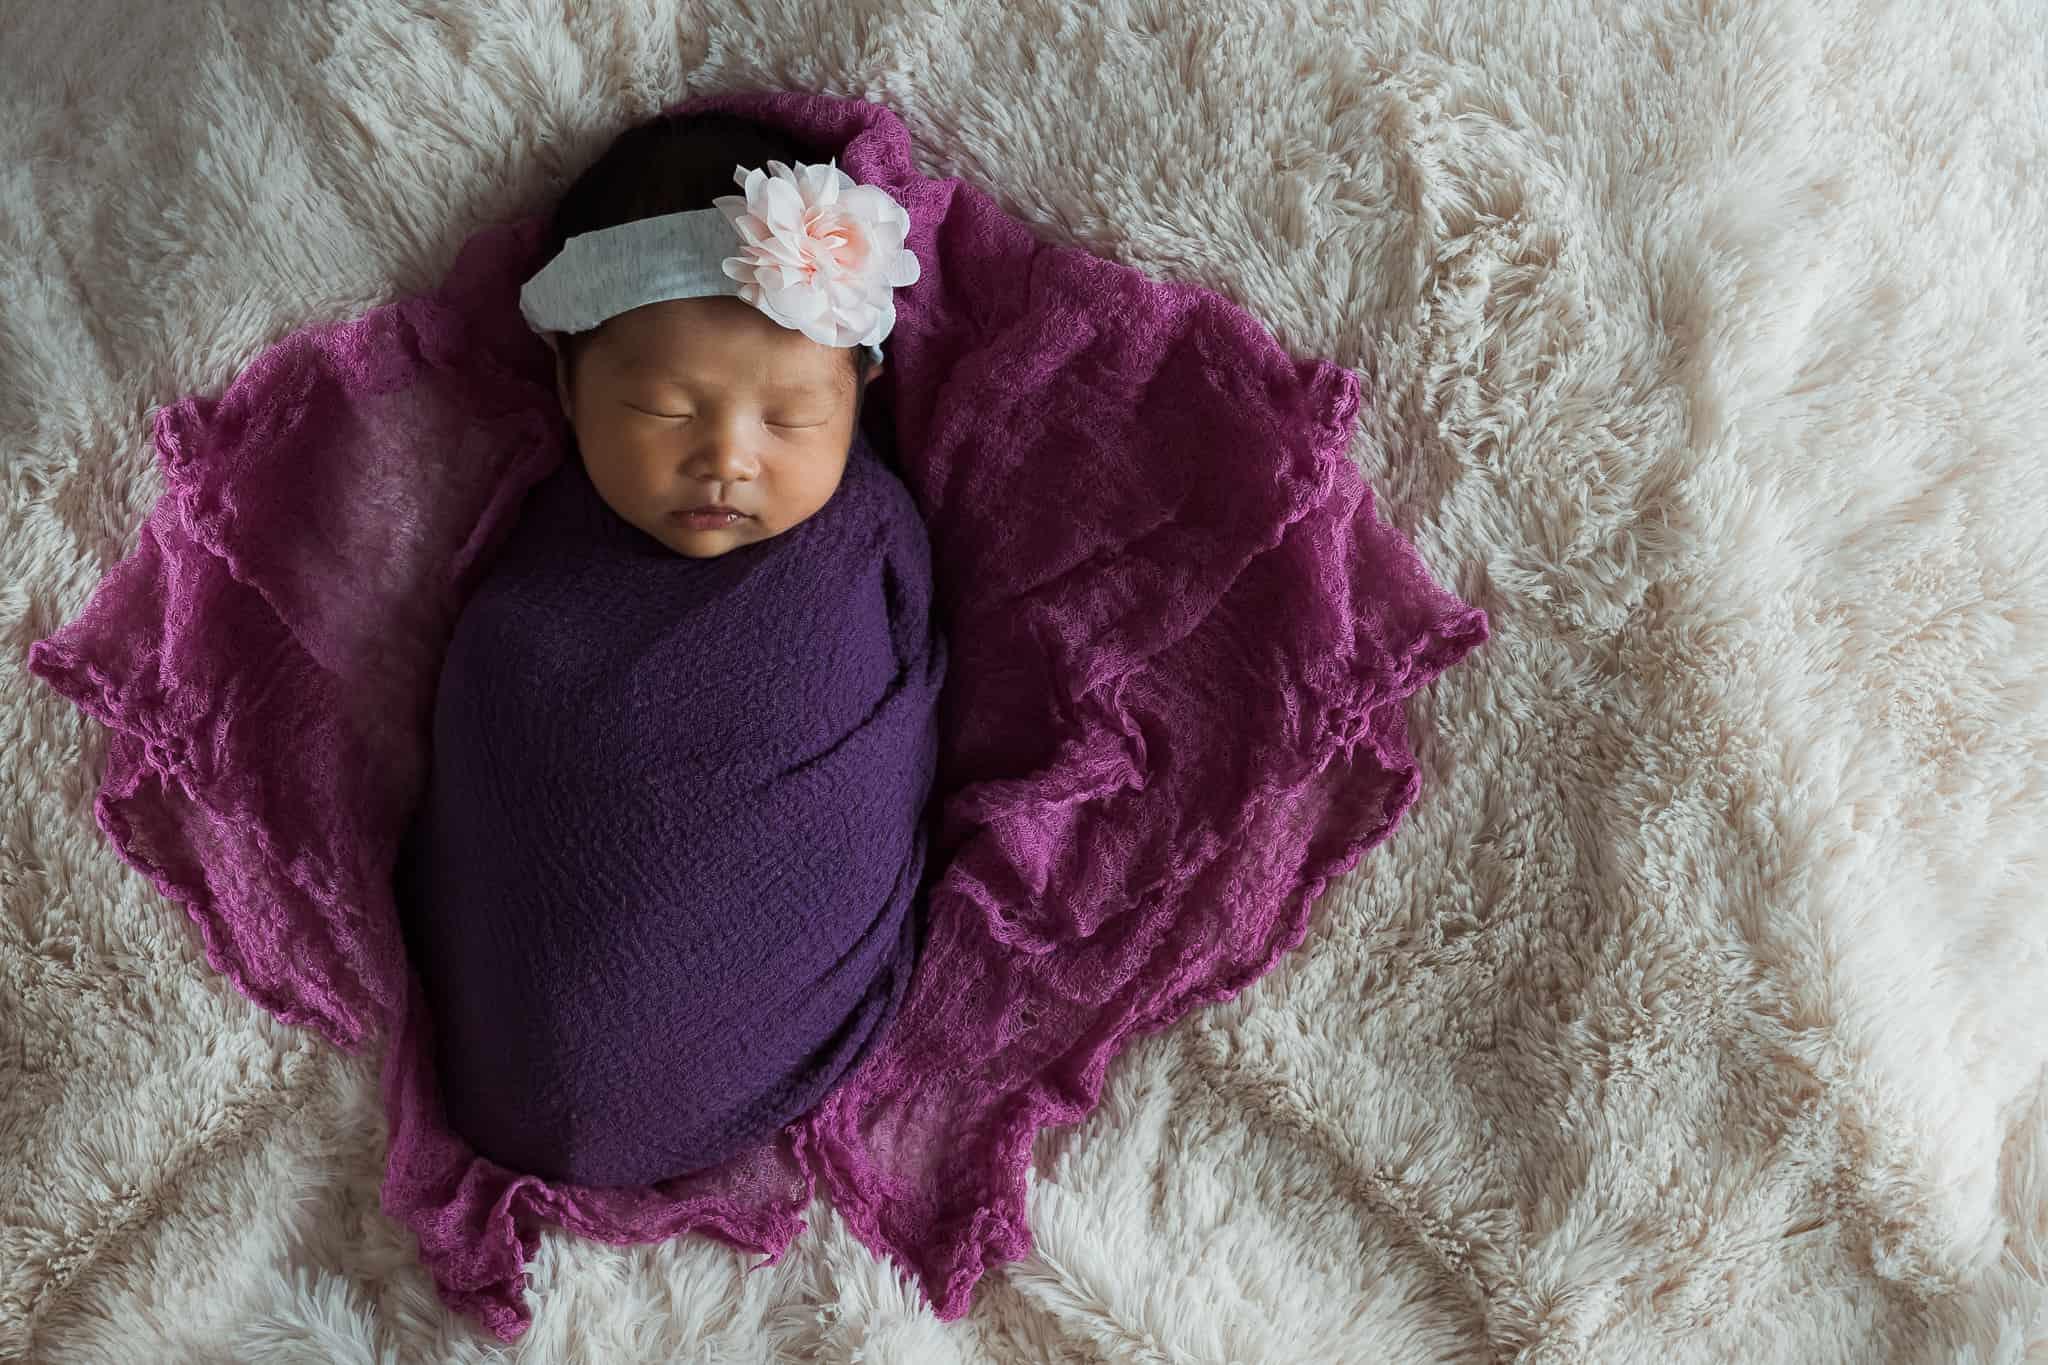 newborn baby swaddled in purple wrap